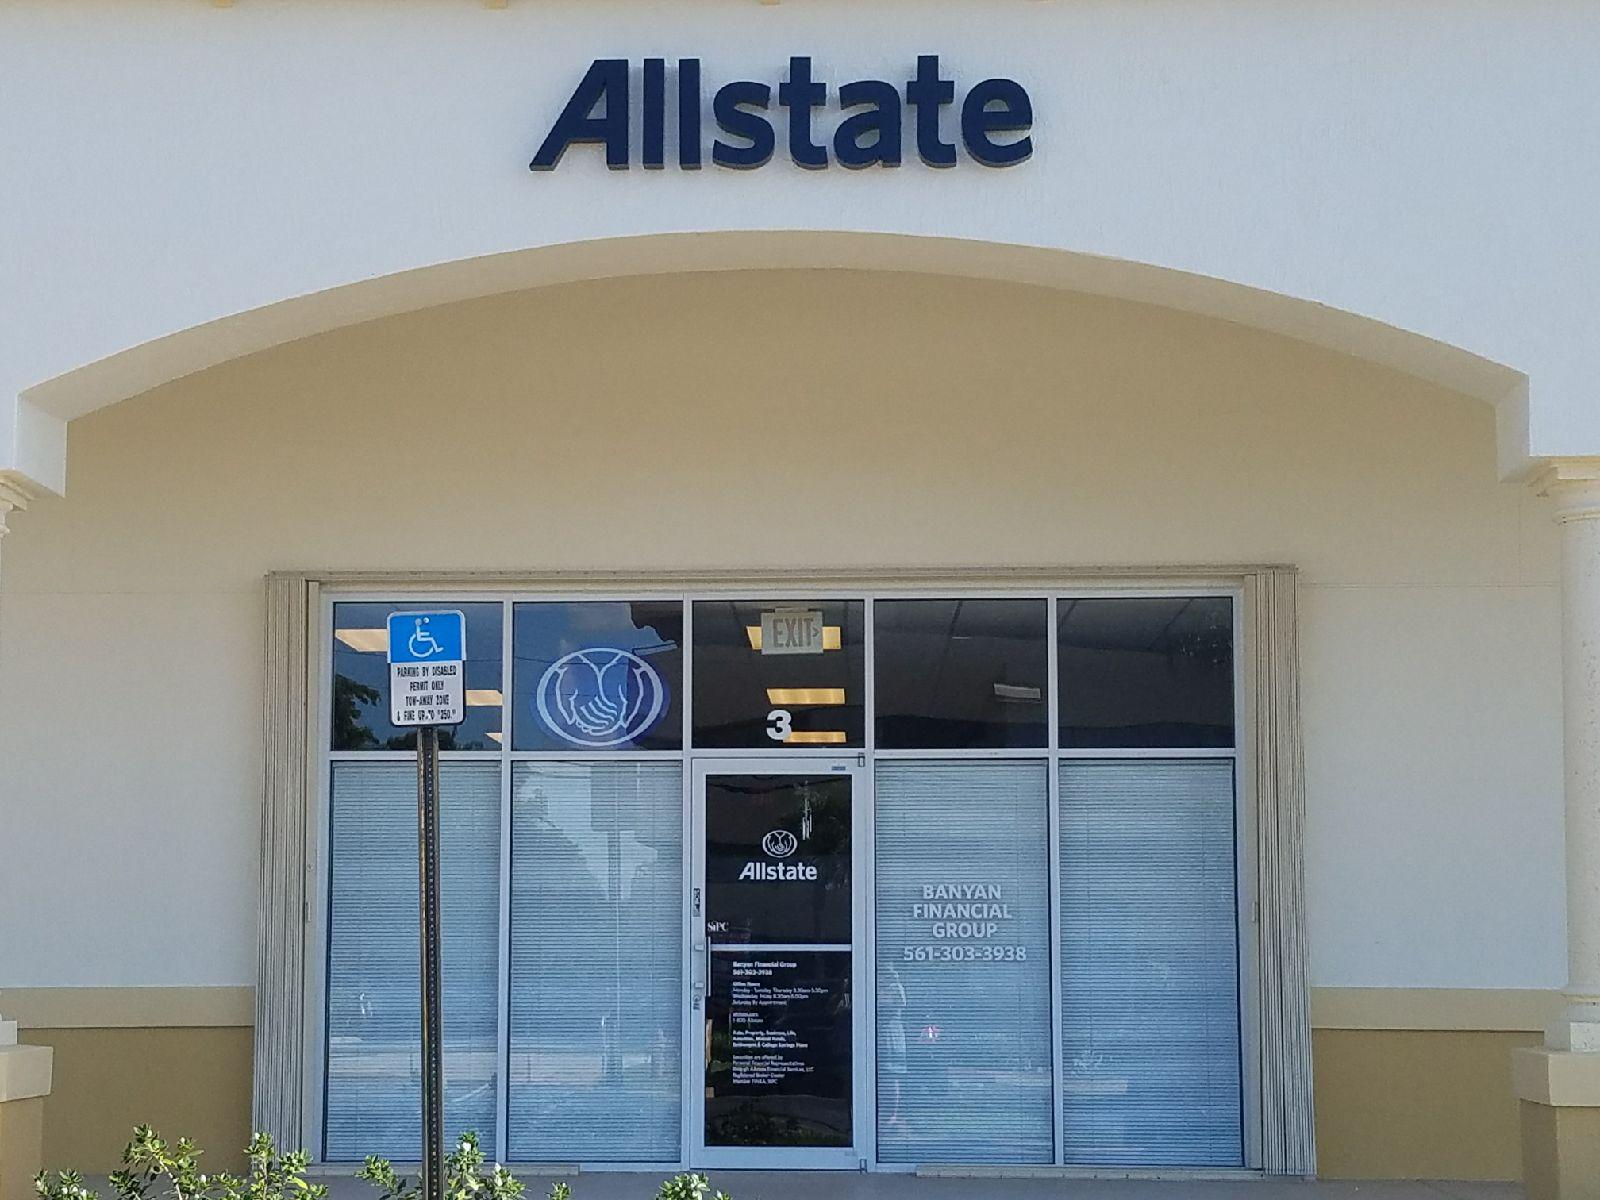 Allstate Insurance Agent: Kelly Davis - Boynton Beach, FL 33426 - (954) 303-3938 | ShowMeLocal.com